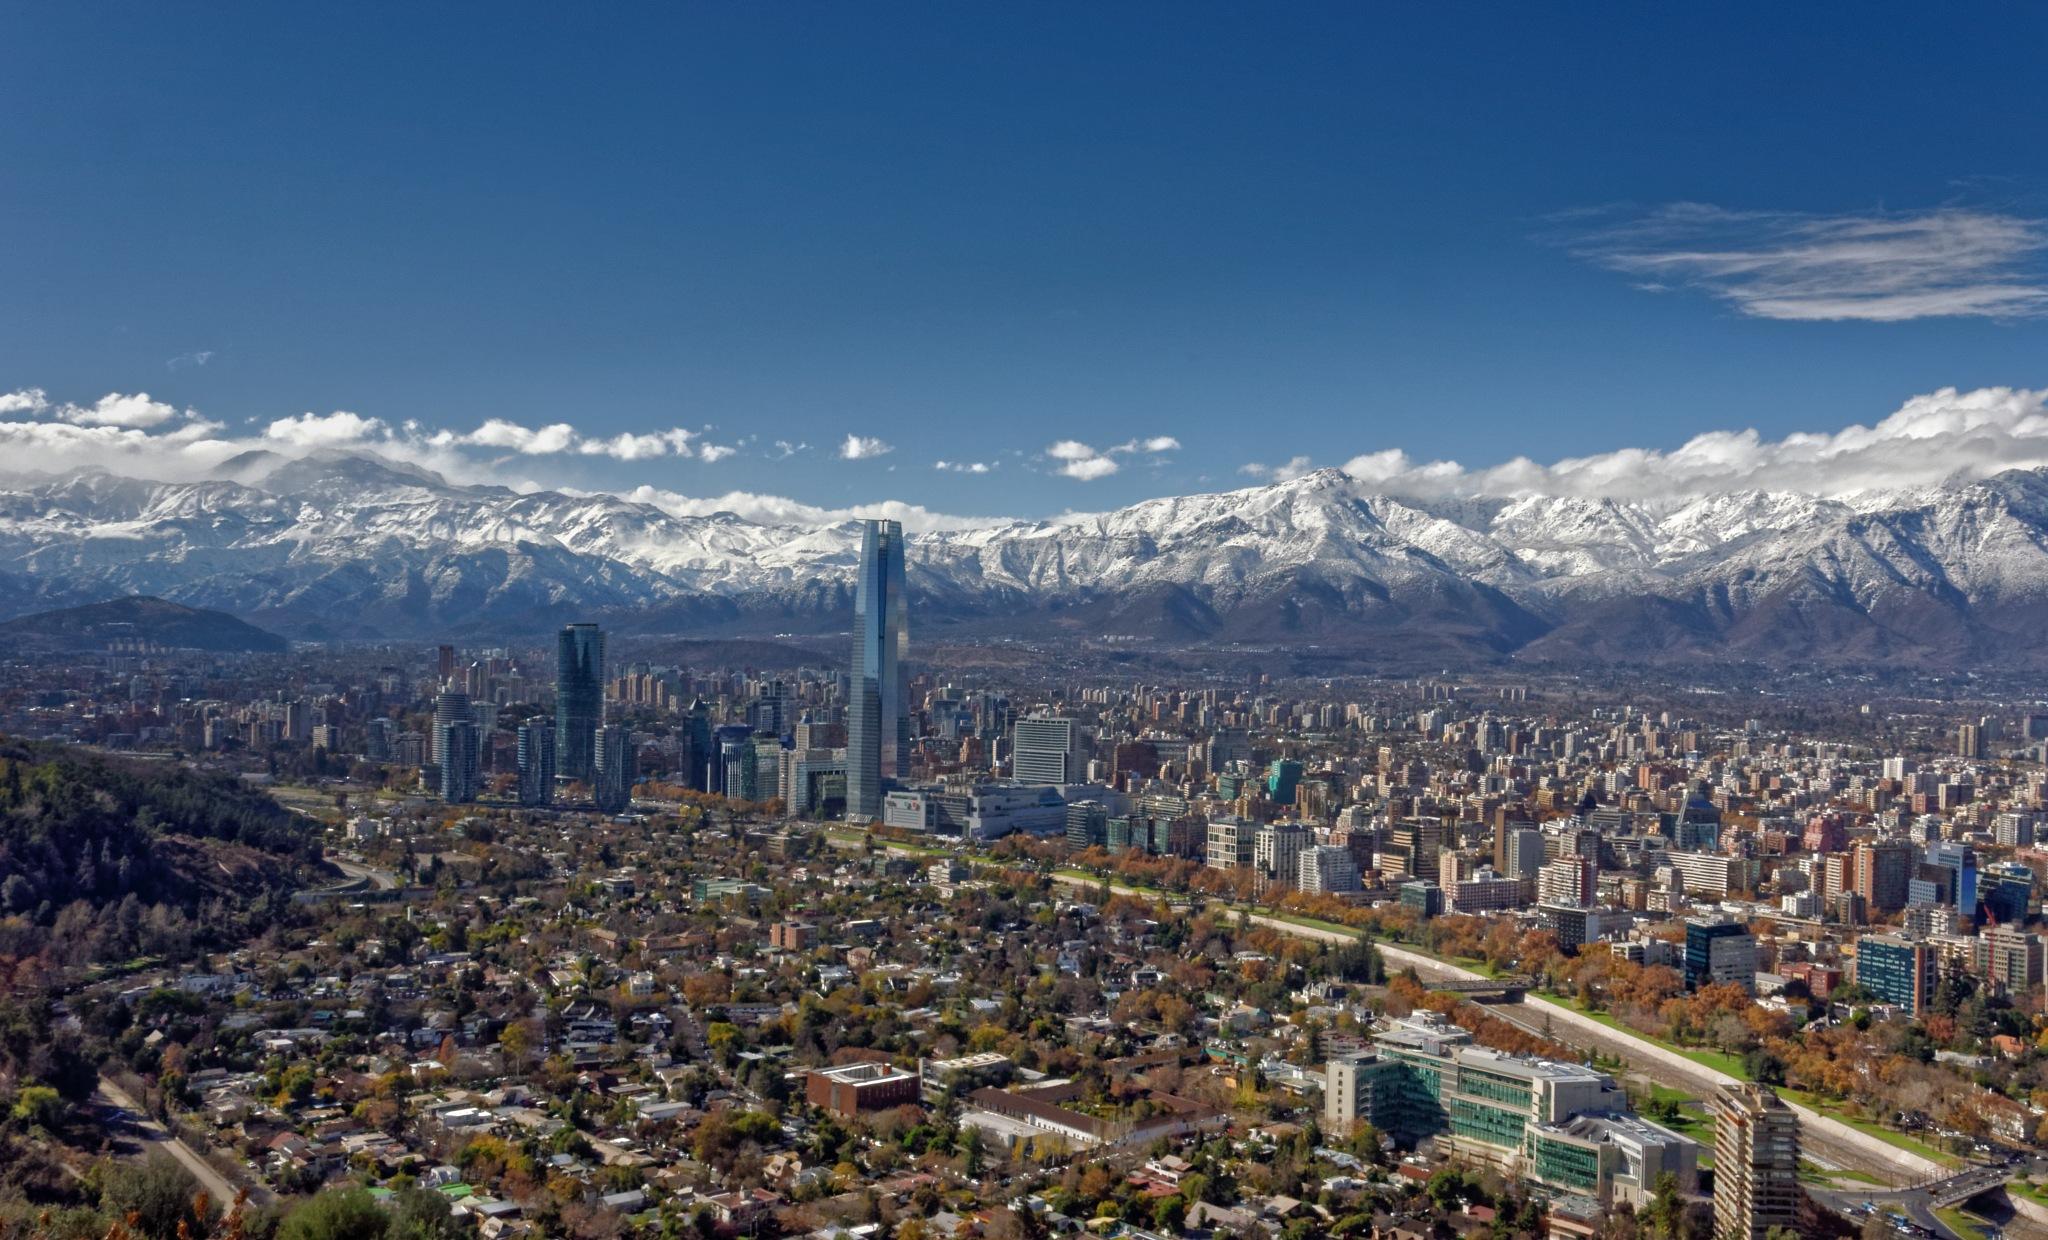 Santiago de Chile by Cristian Araya